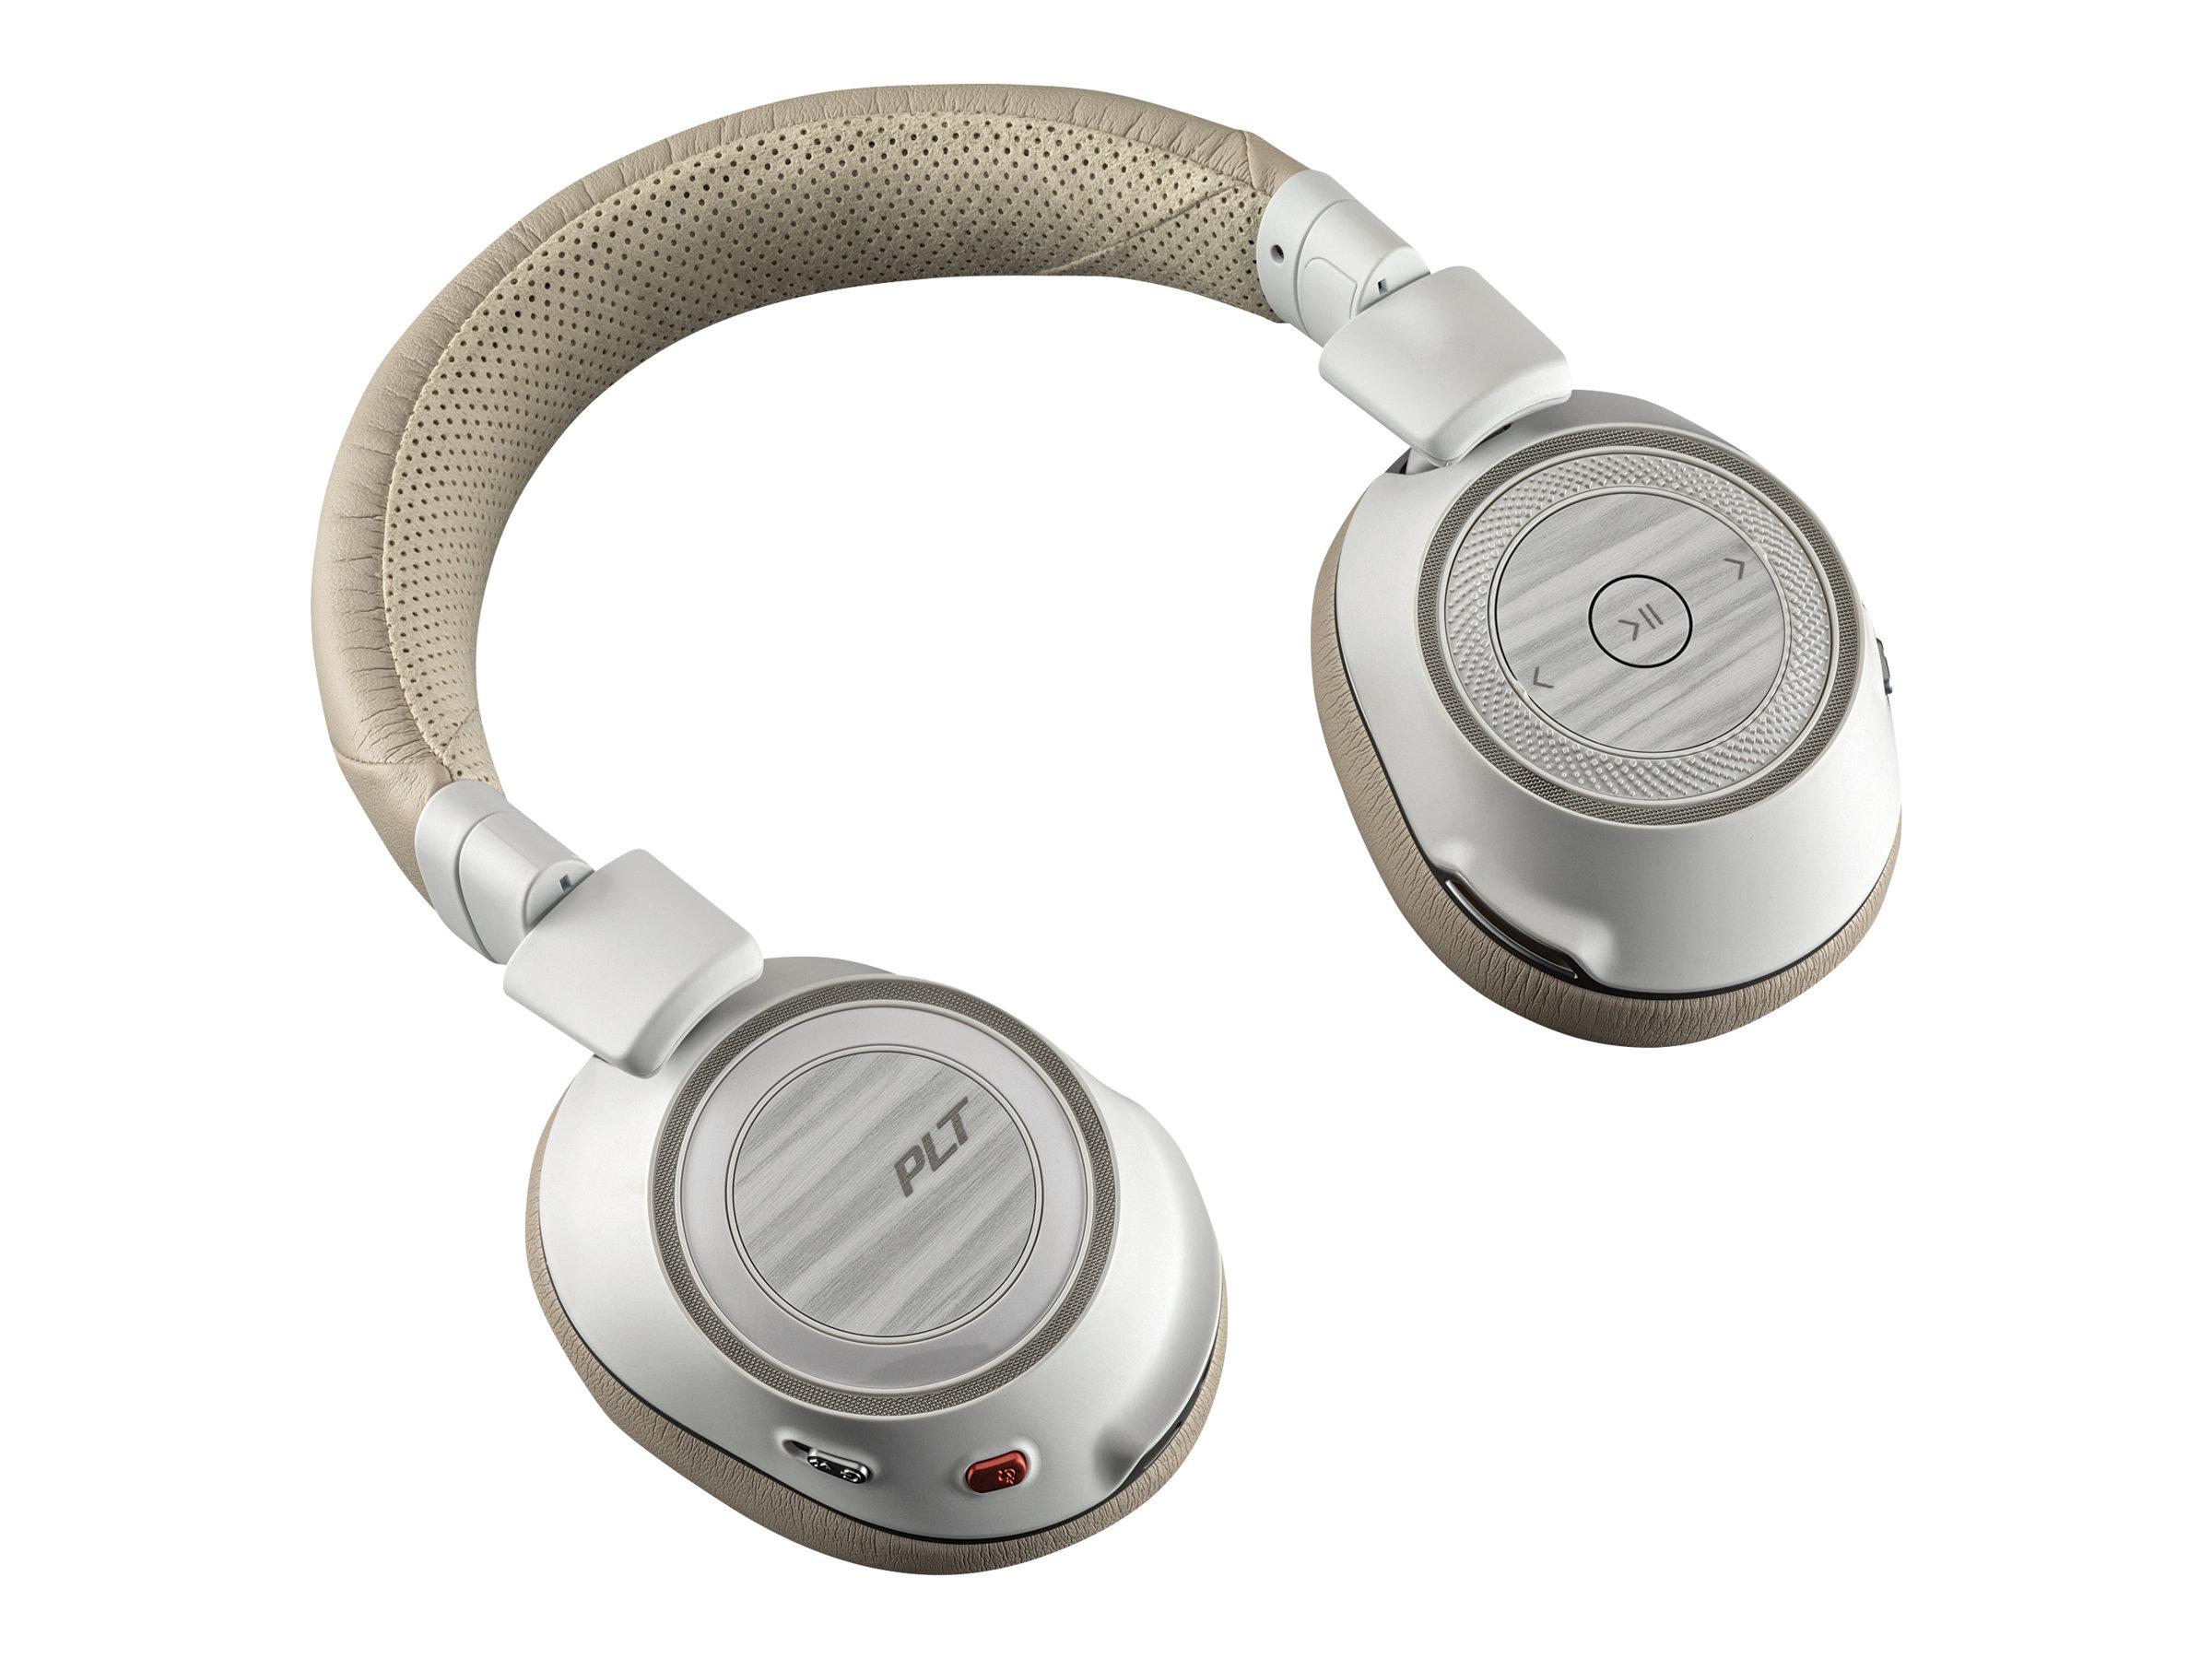 Plantronics Voyager 8200 UC - Kopfhörer mit Mikrofon - Full-Size - Bluetooth - kabellos - NFC